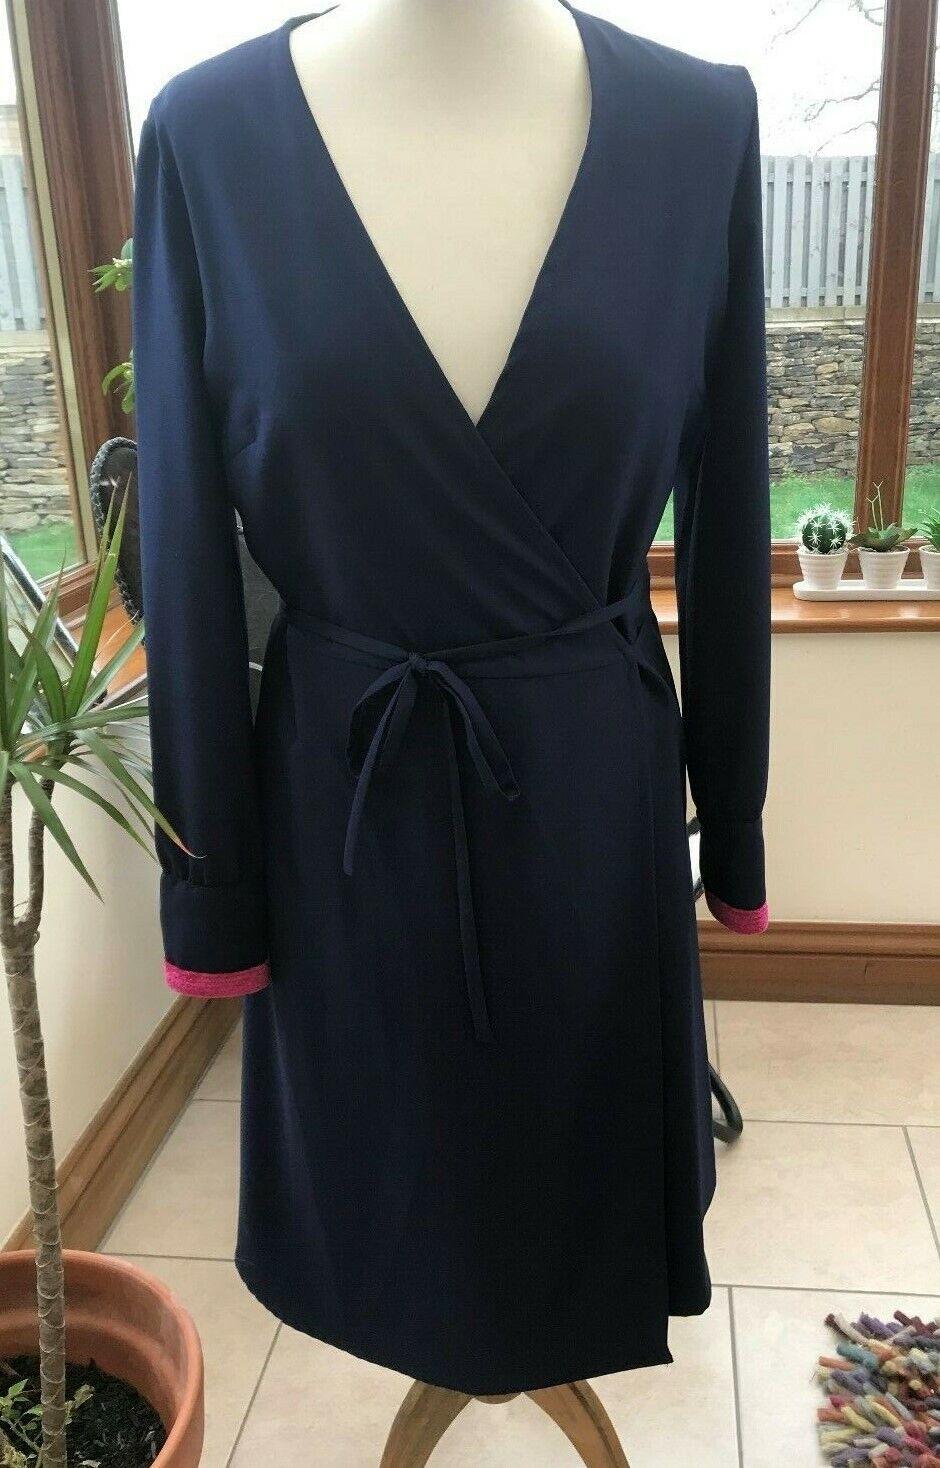 Vilagallo Designer Bleu marine Longueur Genou Robe portefeuille rose velours poignets BNWT s16